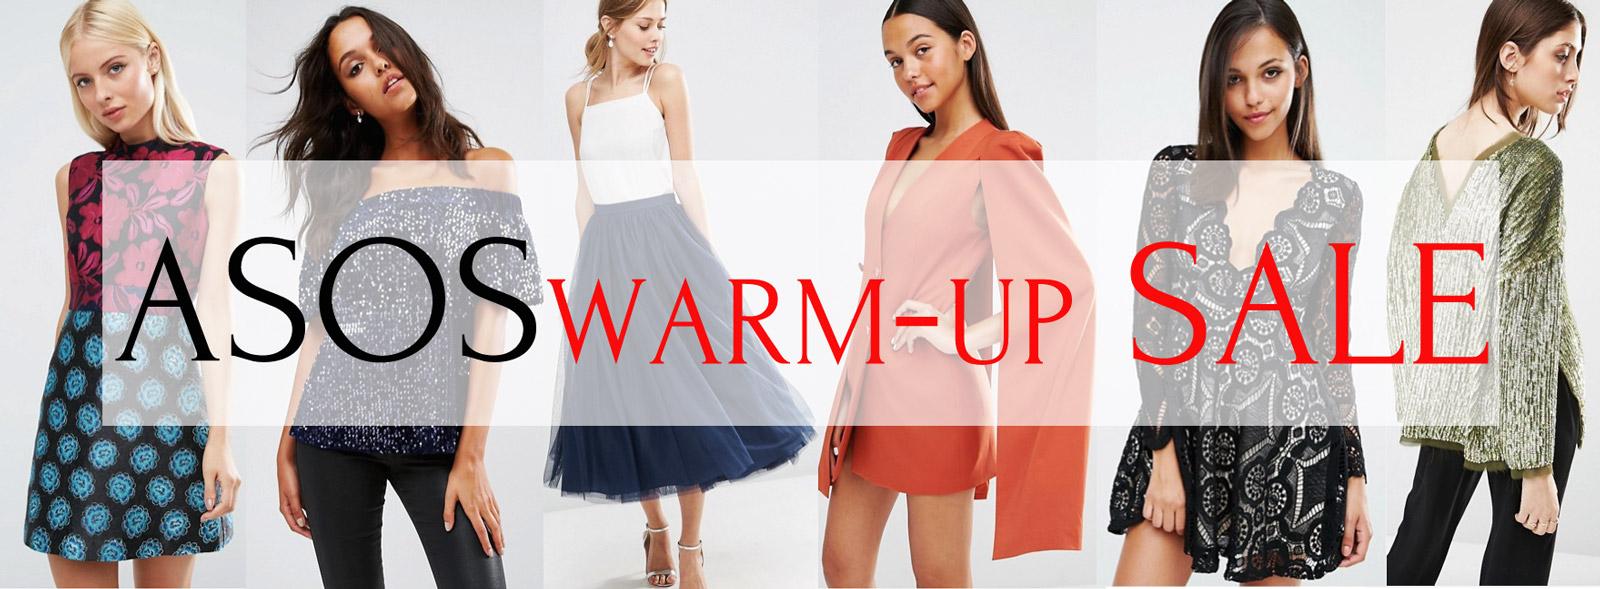 asos-warm-up-sale